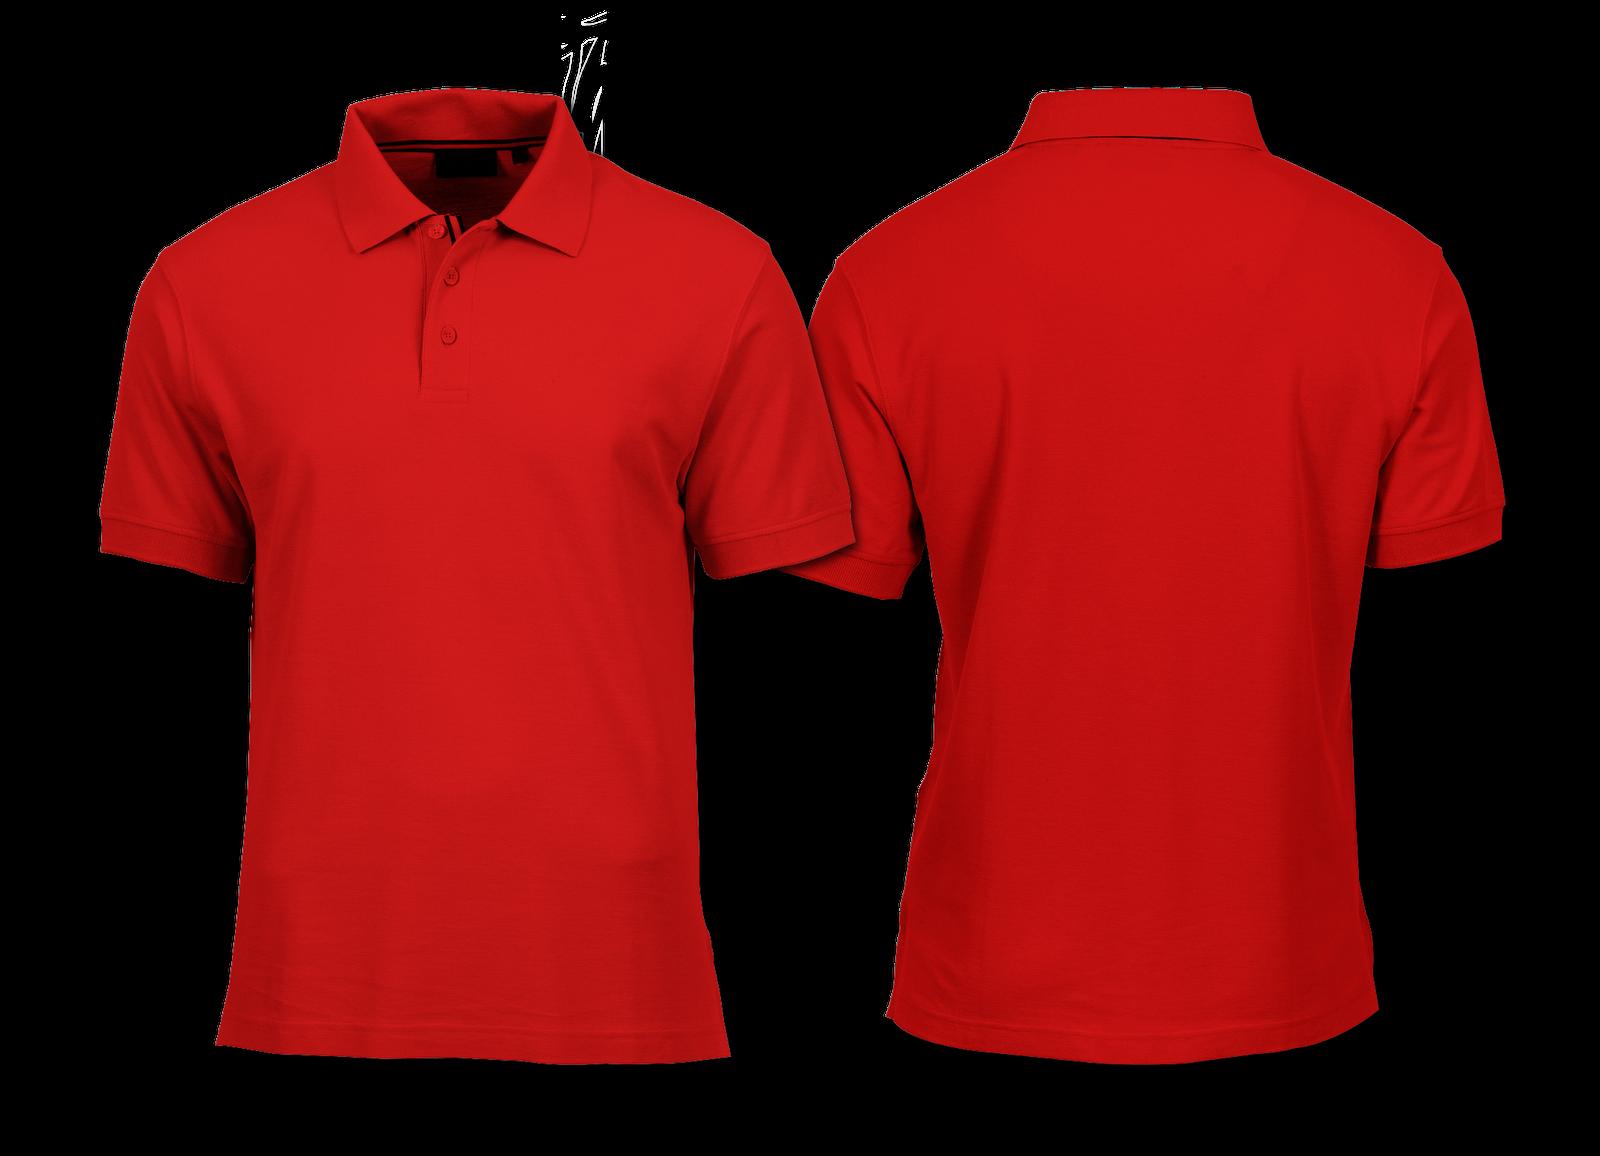 Download Gembel Keren.: Mock-Up Polo Shirt.